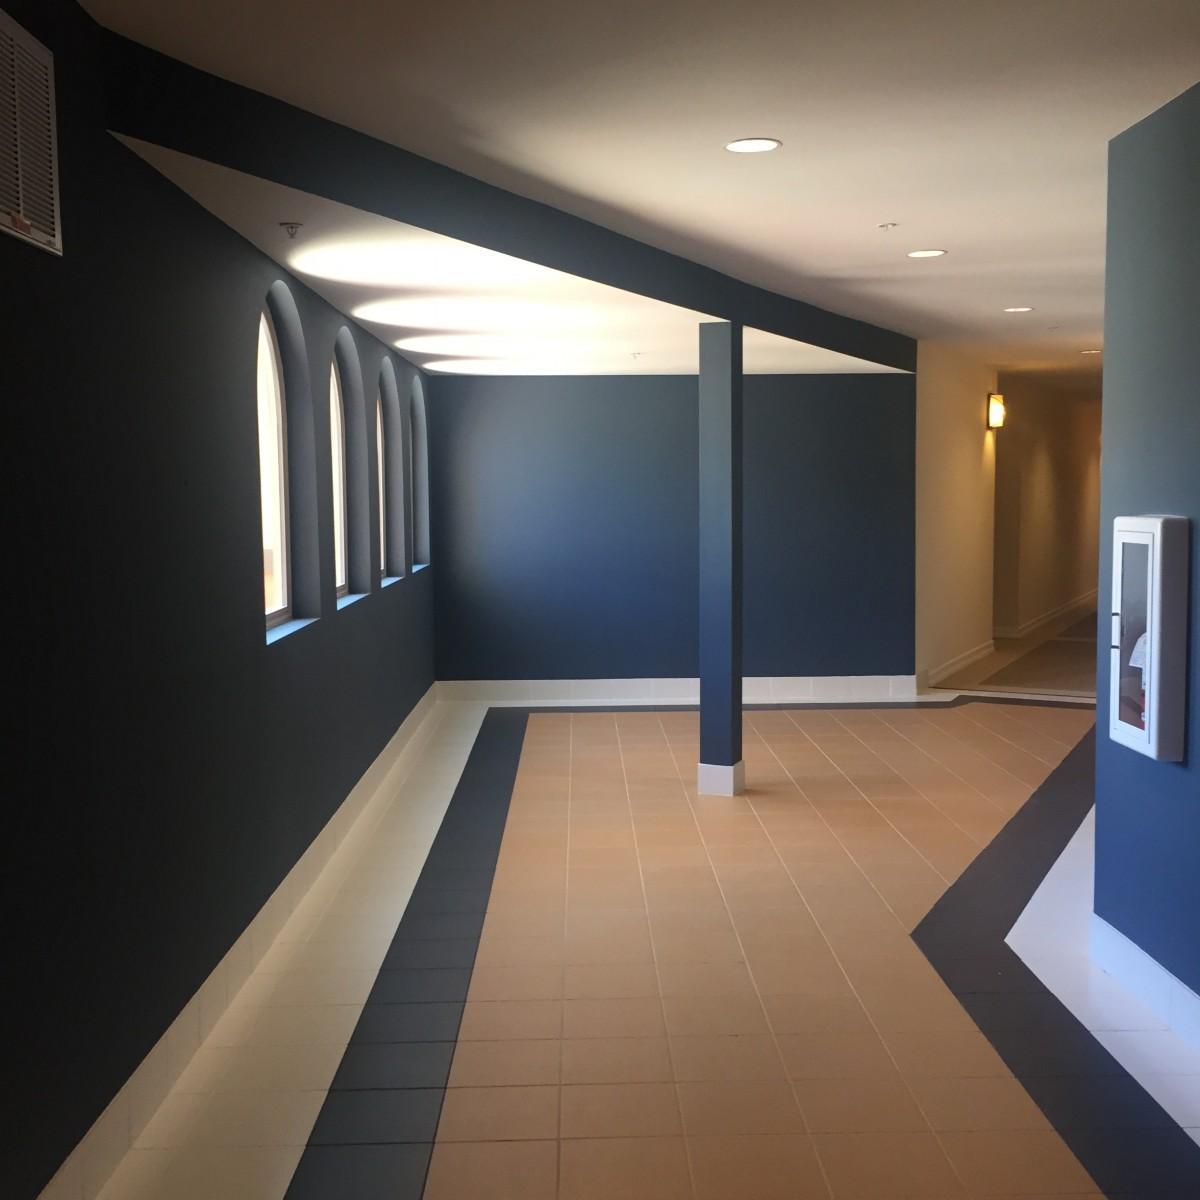 Fotos gratis arquitectura piso techo sala - Iluminacion habitacion ...